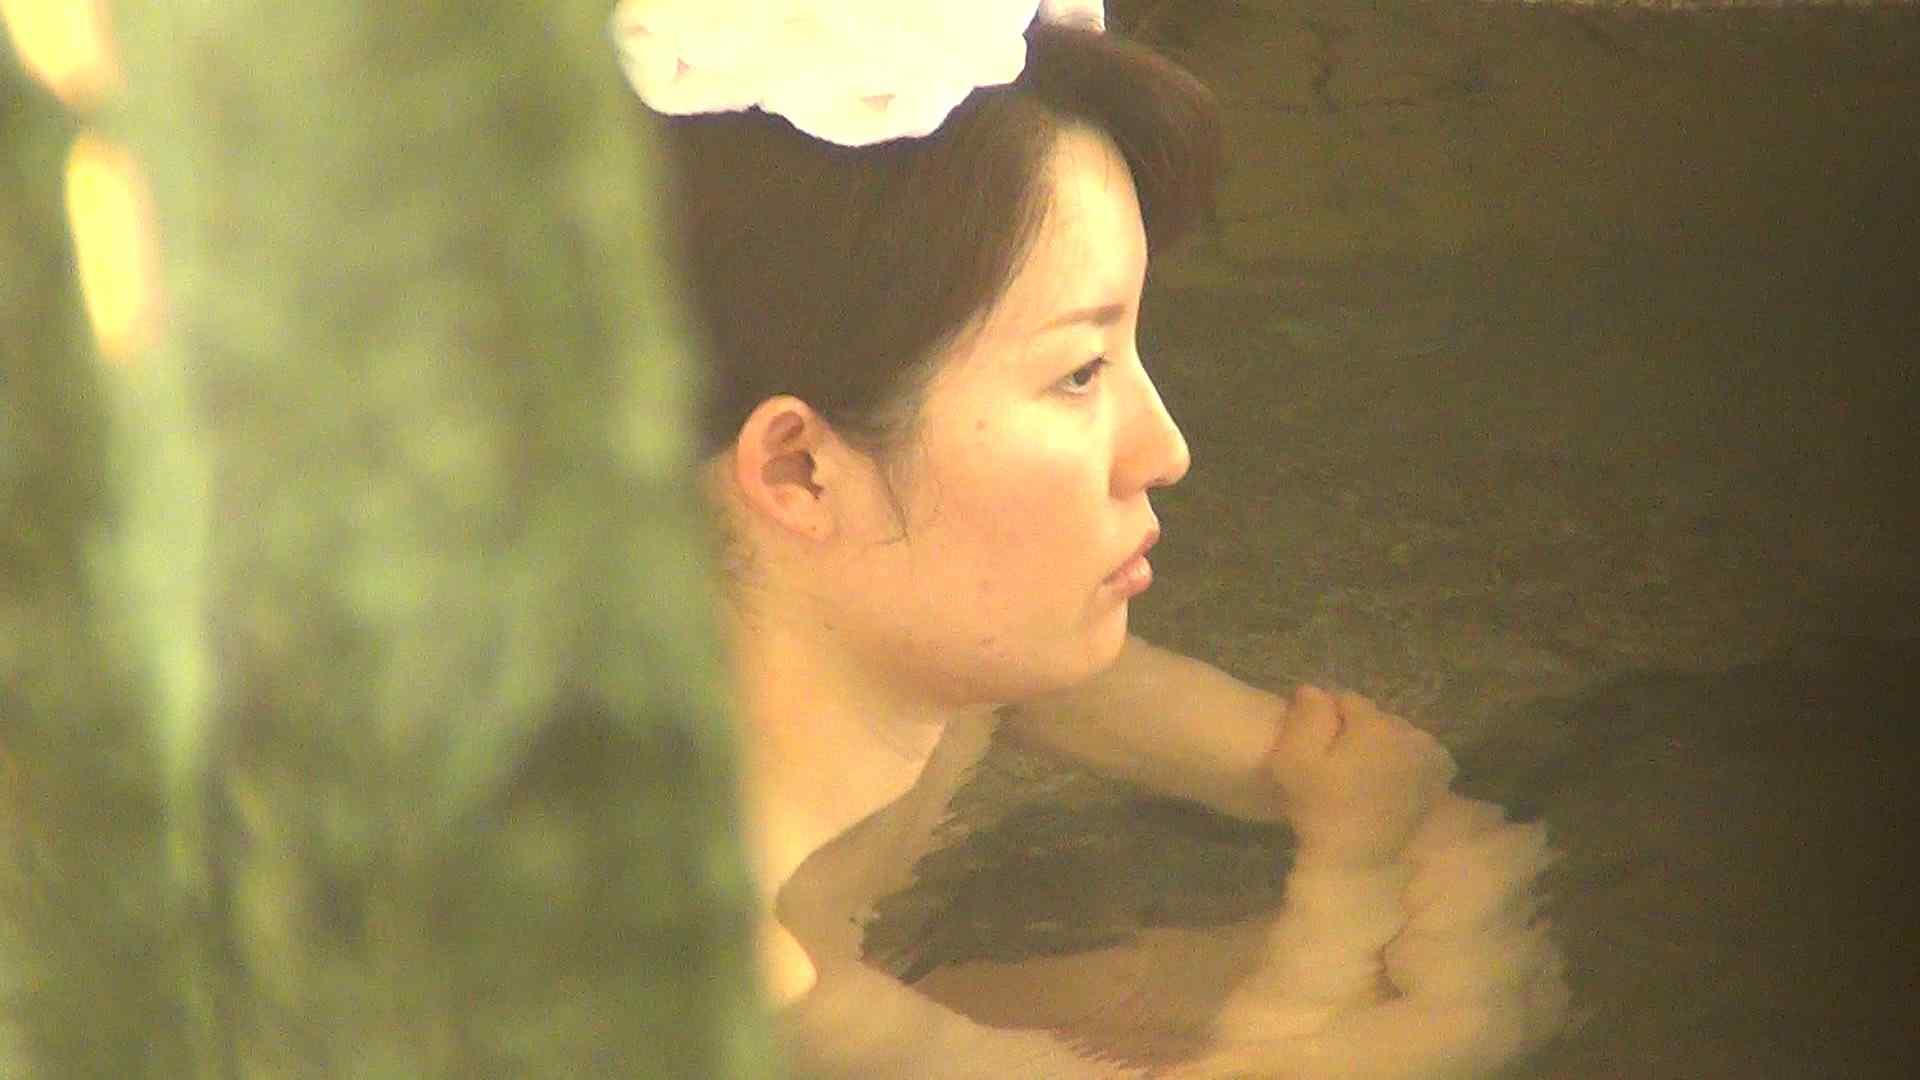 Aquaな露天風呂Vol.301 OLのエロ生活 すけべAV動画紹介 112連発 101